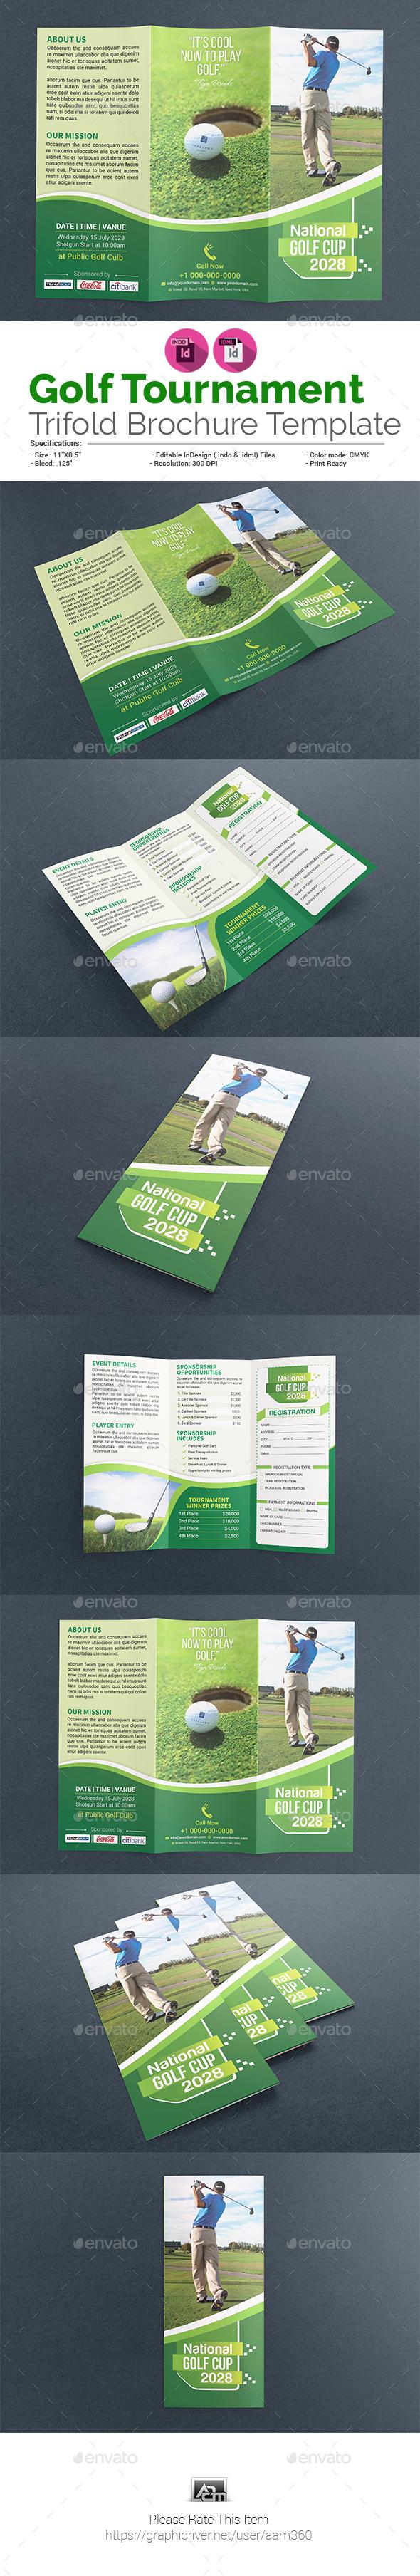 Golf Trifold Brochure - Informational Brochures